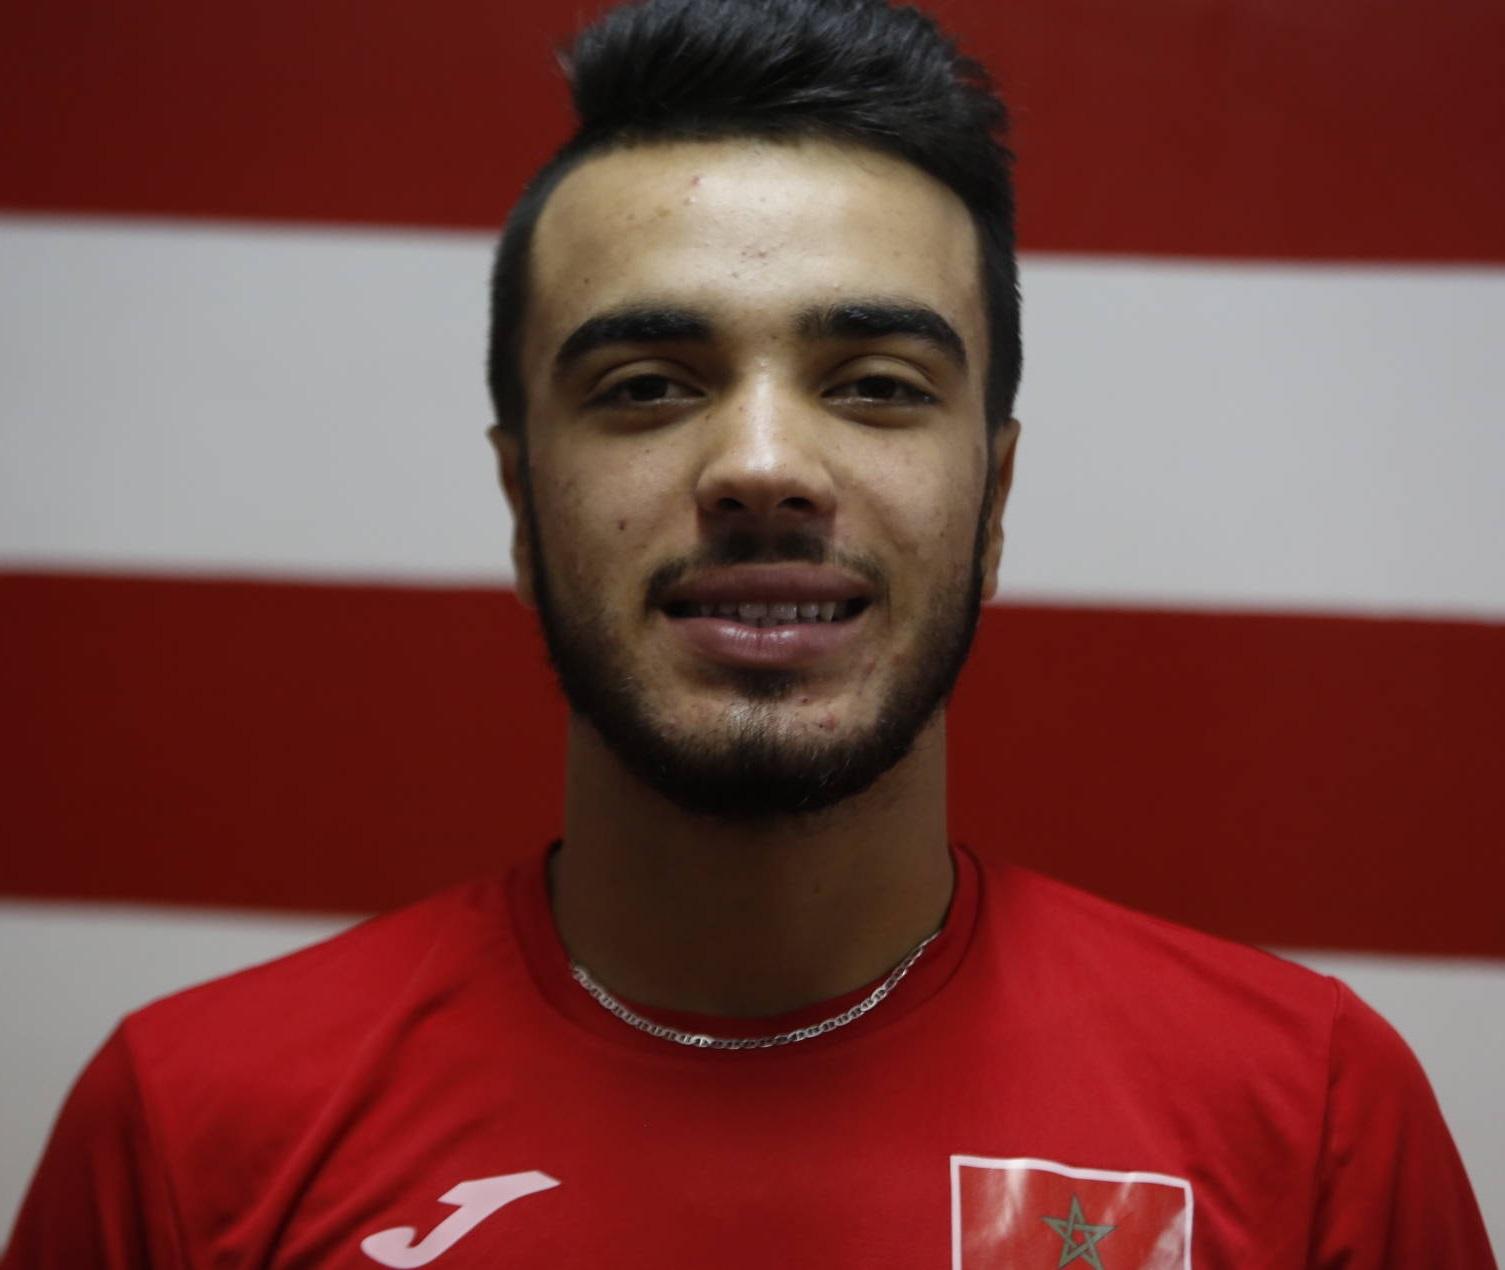 Abdelhalim Abou Elfath